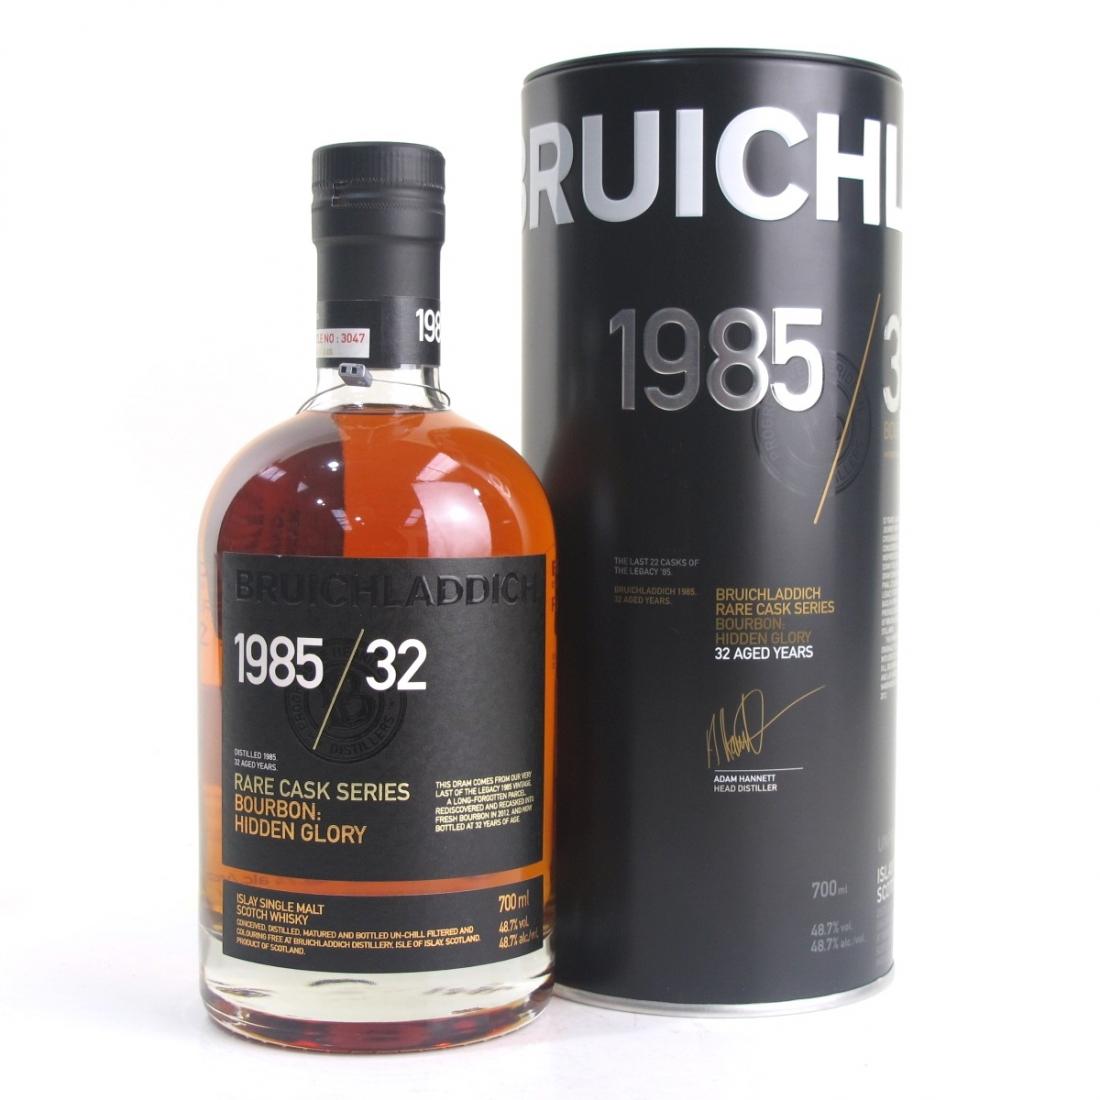 Bruichladdich 1985 Rare Cask Series 32 Year Old / Hidden Glory